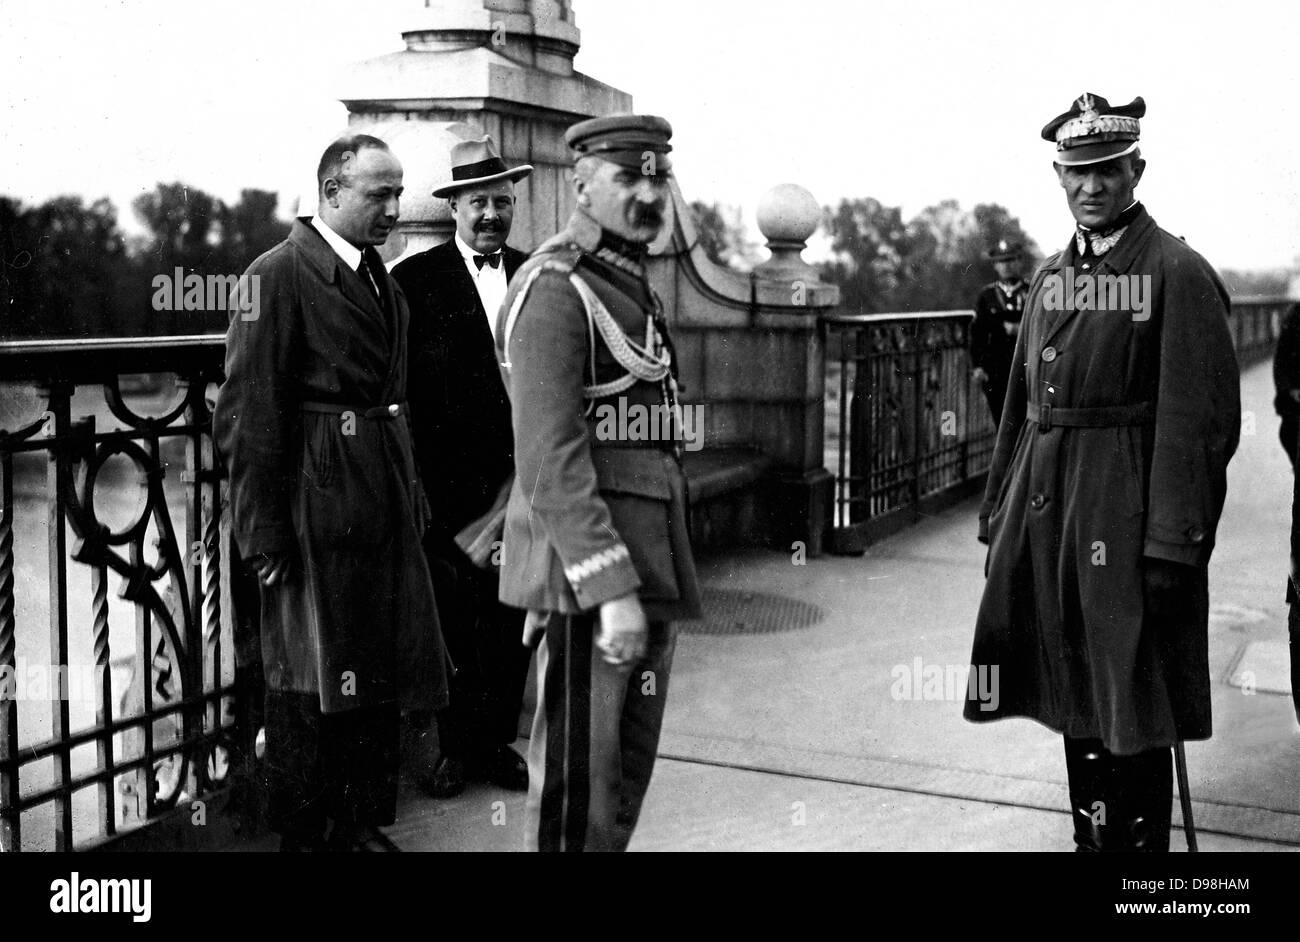 marshall Josef Pi?sudski on the Poniatowski Bridge, Warsaw, 12 May 1926, during the May Coup d' État. Also present Stock Photo